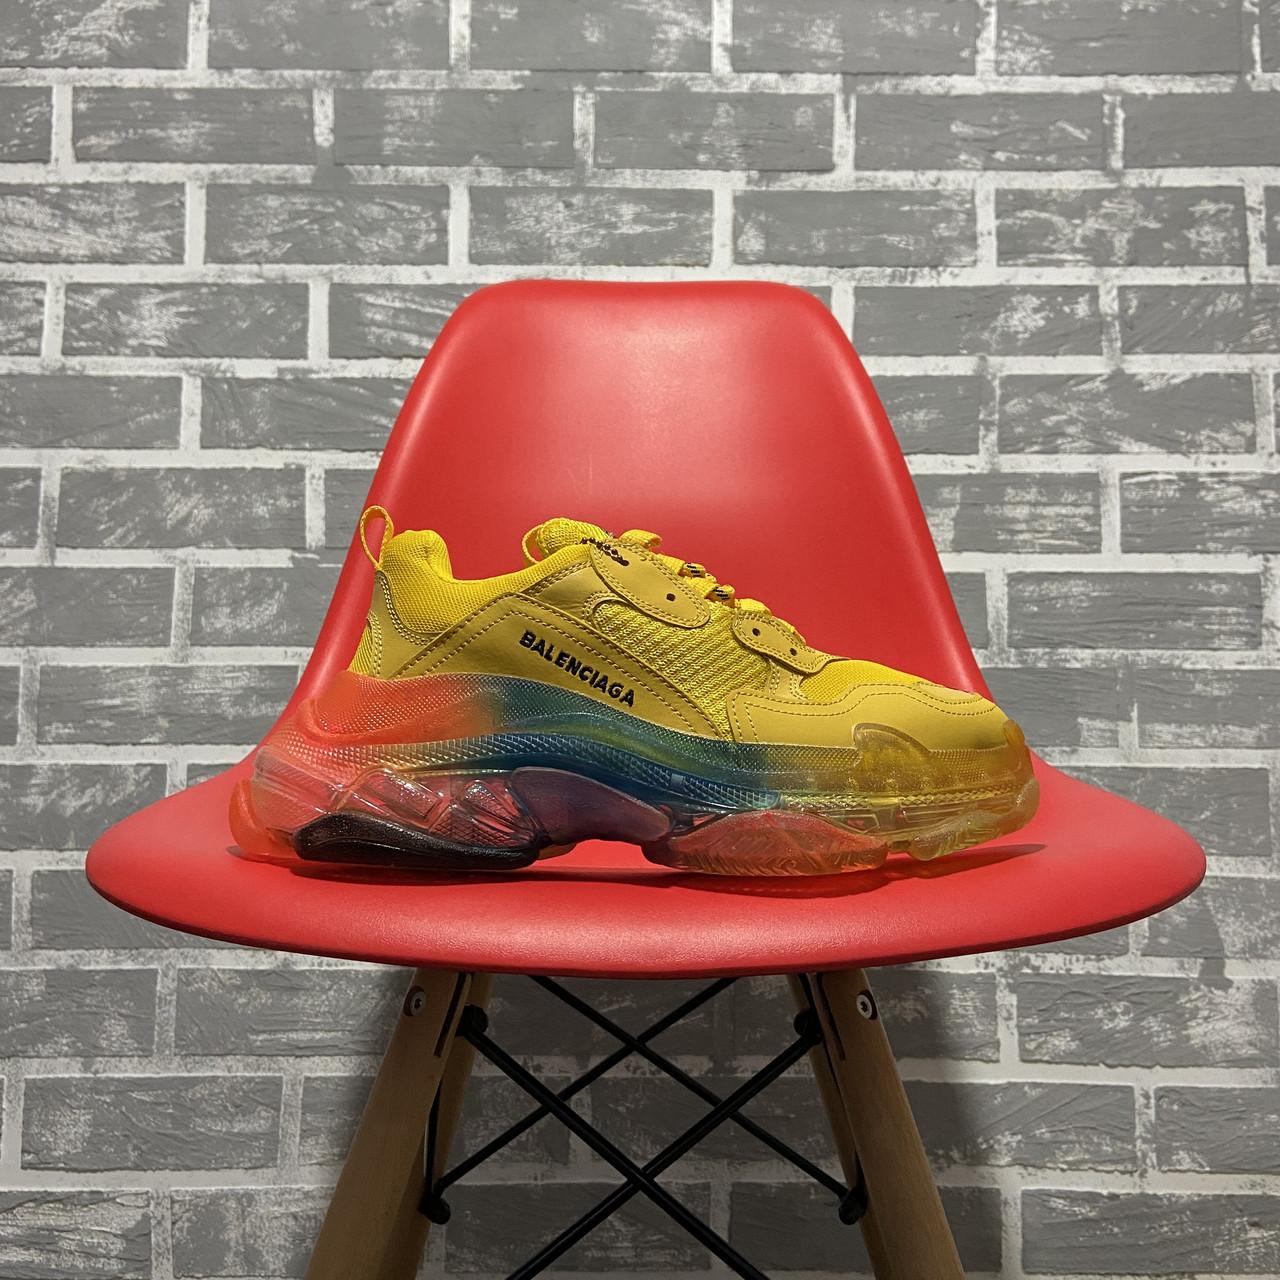 Женские кроссовки в стиле Balenciaga Triple S Clear Sole Yellow Rainbow (Кроссовки Баленсиага Трипл С)